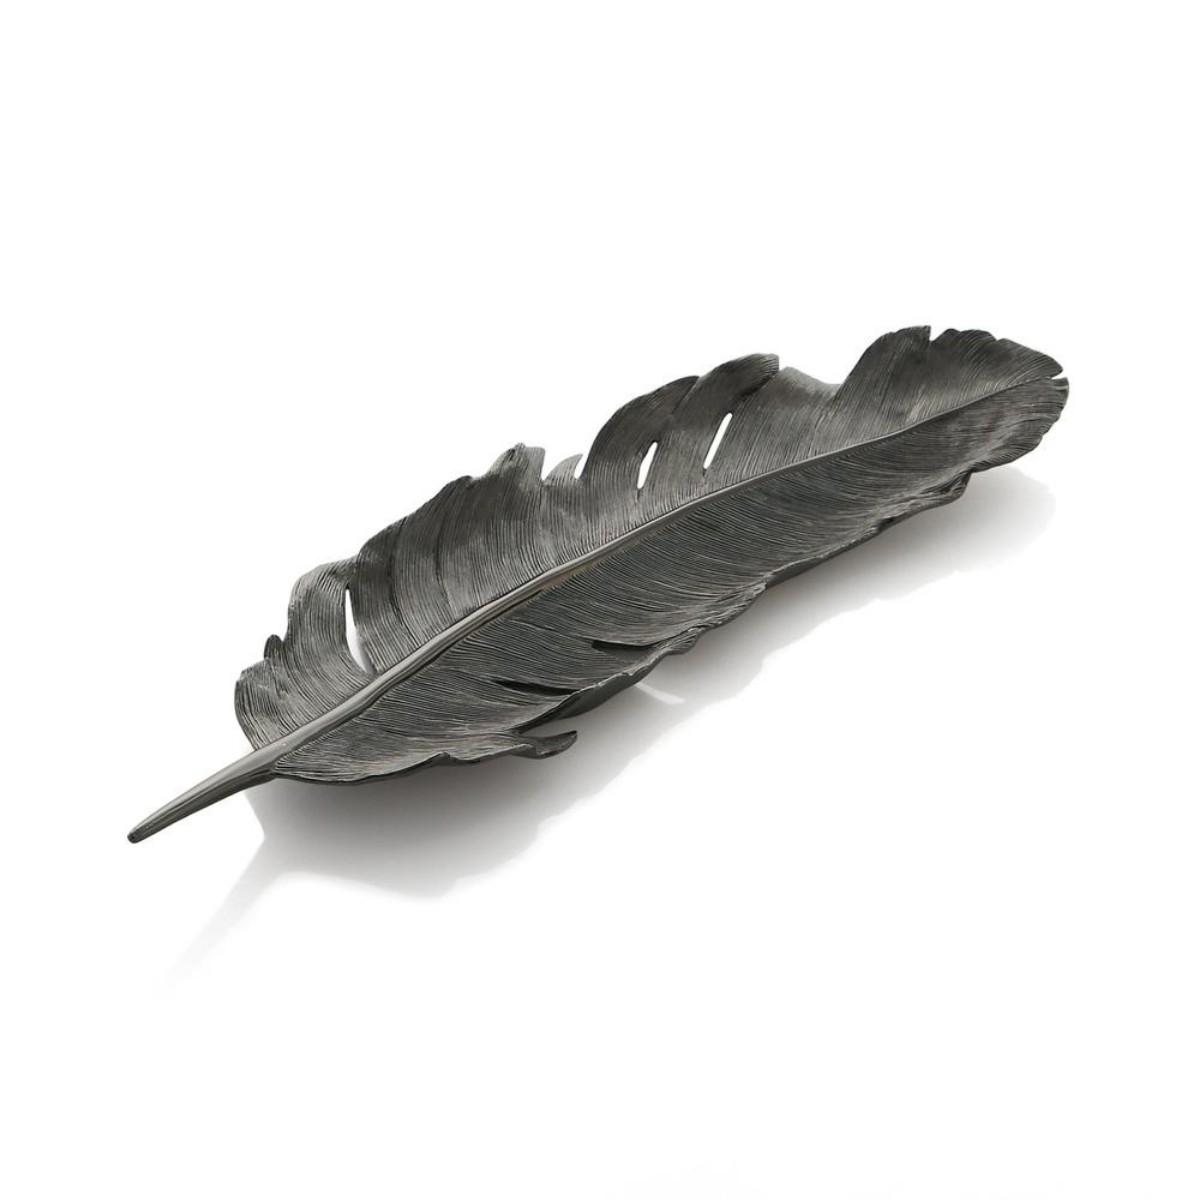 Michael Aram I Feather Tray I Black